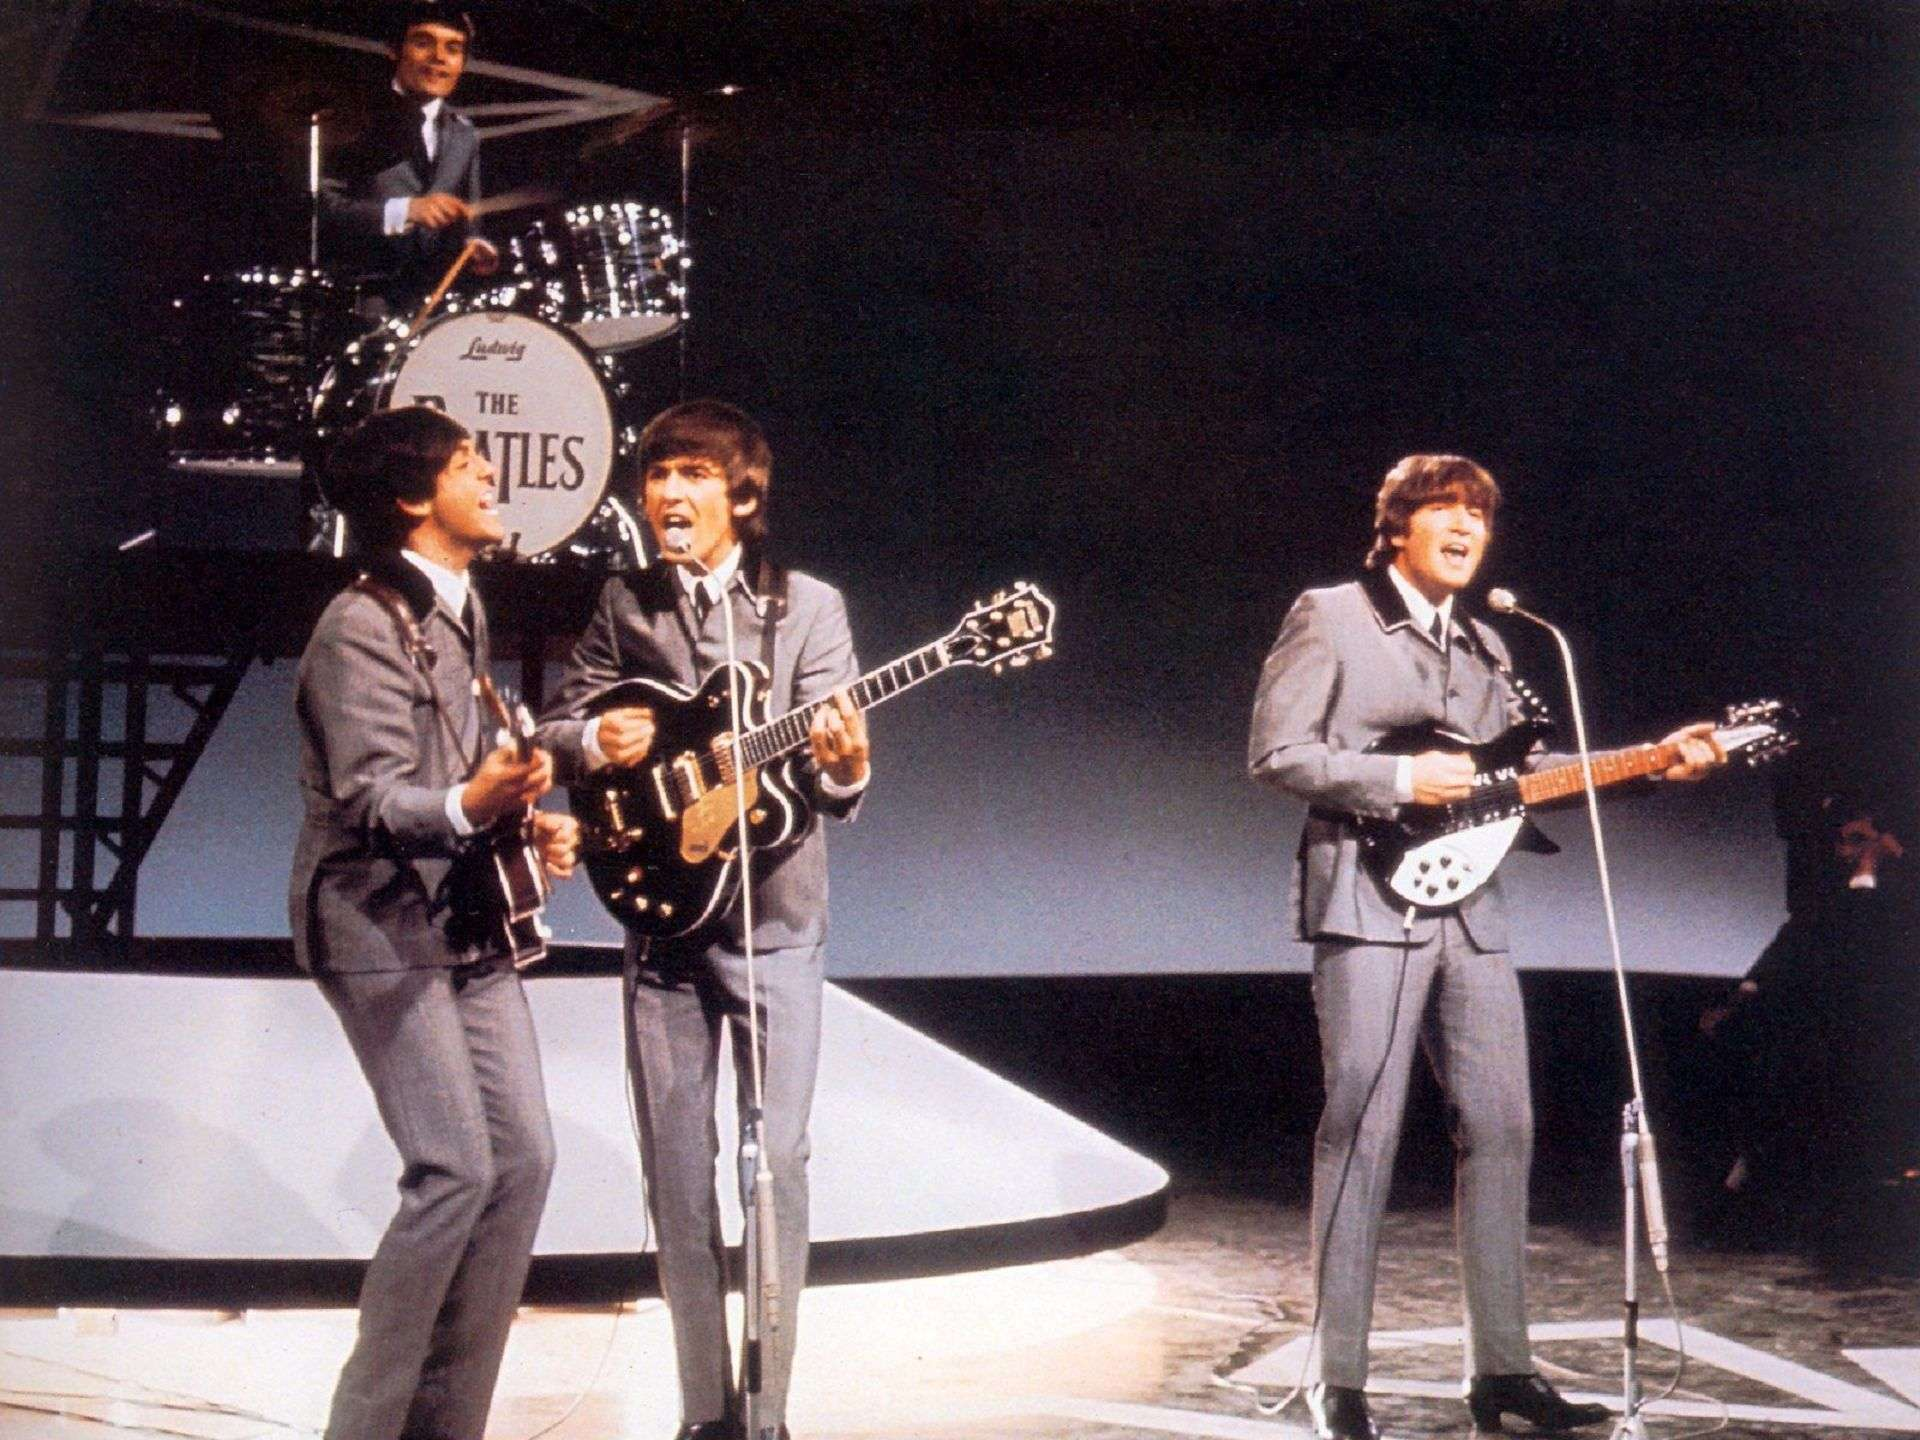 45+ Beatles Widescreen Wallpaper HD on WallpaperSafari